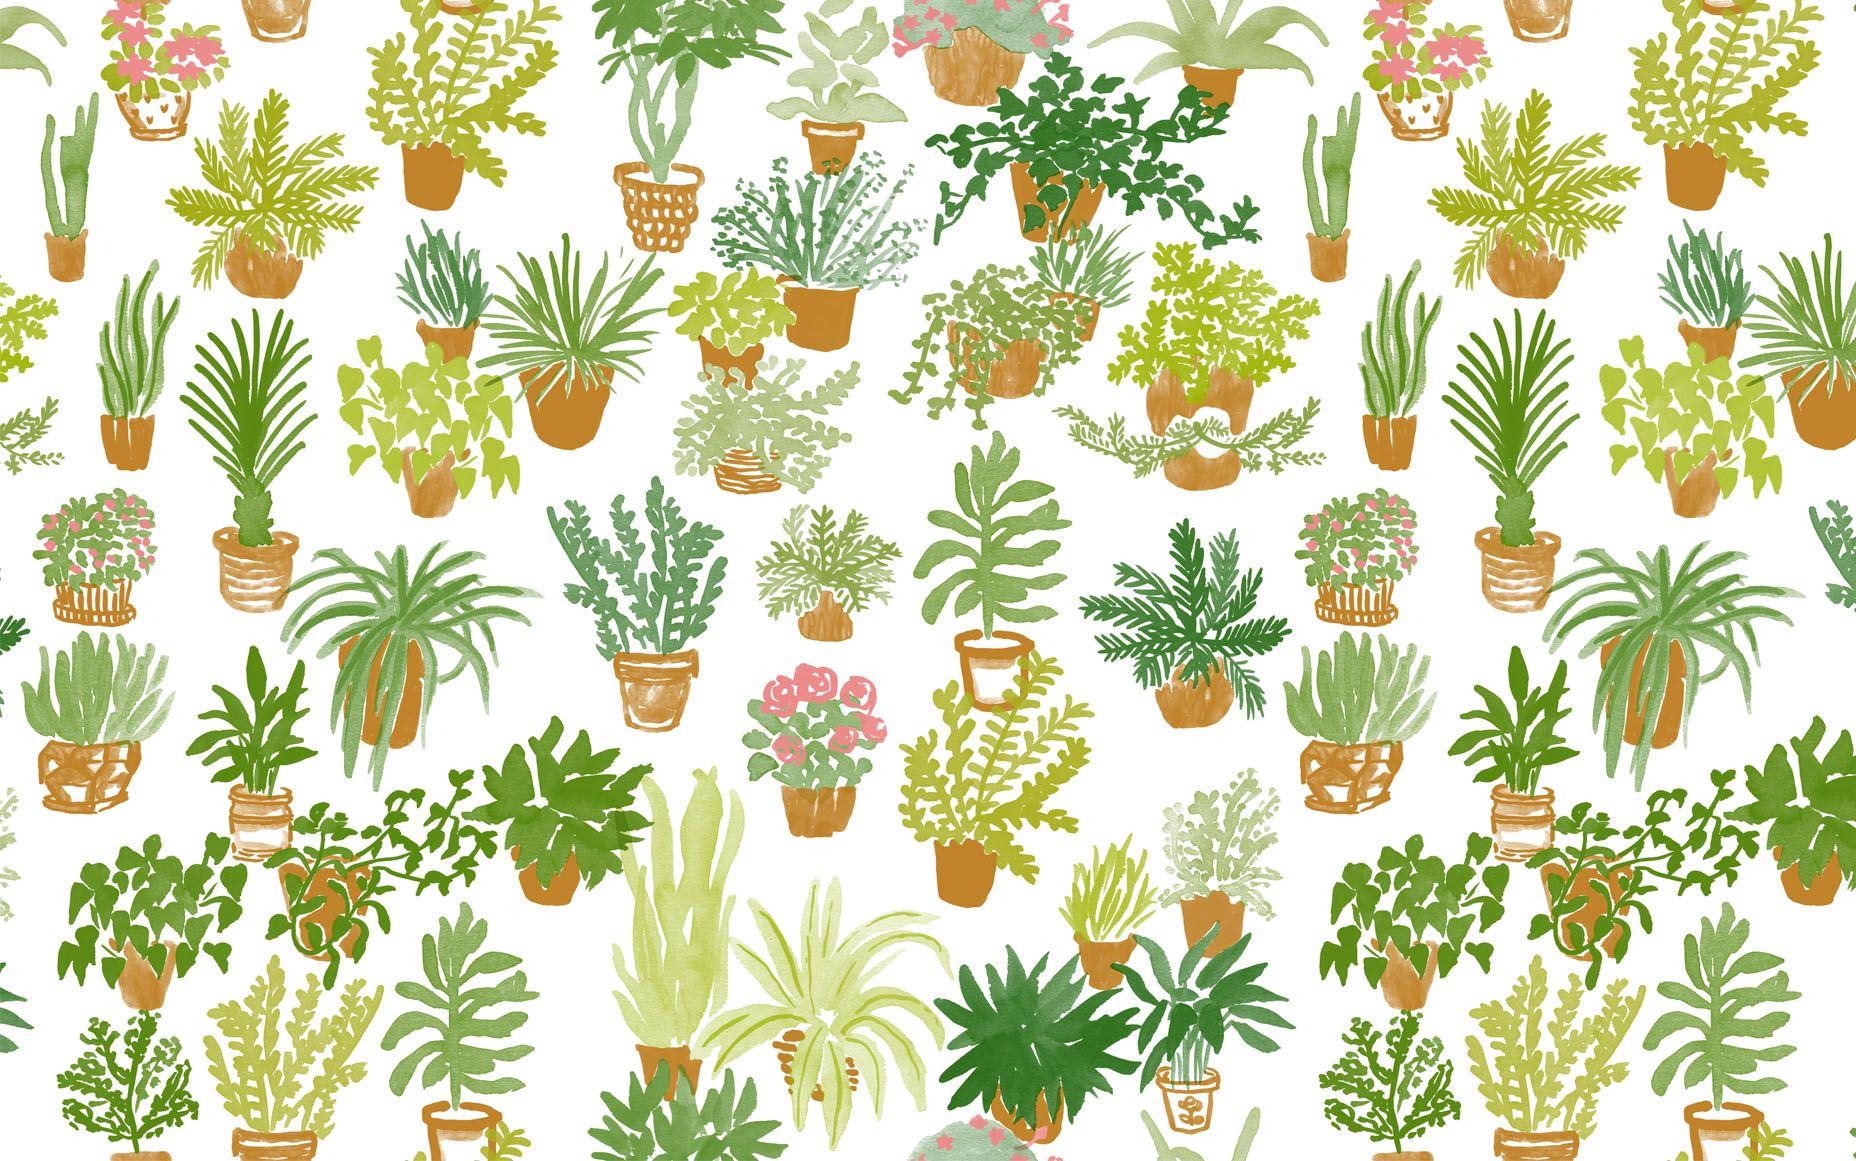 Cute Cactus Wallpaper Macbook 25 Wallpapers Lindos Pra Incrementar Seu Computador